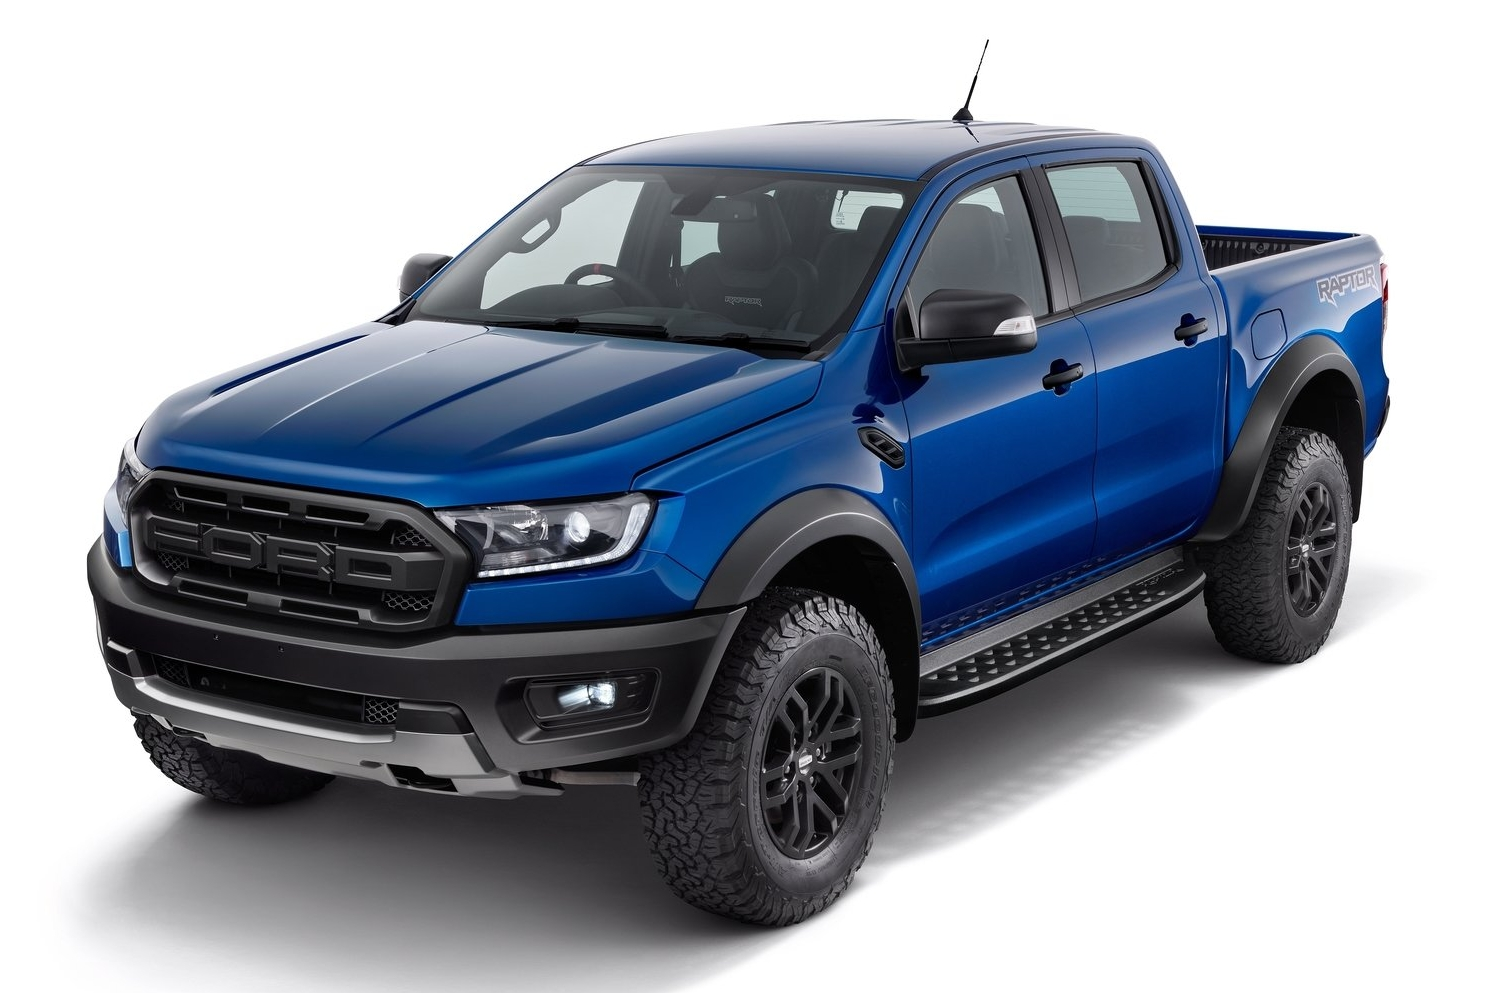 2019 Ranger Raptor >> แรงฝุ่นตลบ ! กับเหล่ากระบะพันธุ์โหด Ford Ranger Raptor / Chevrolet Colorado ZR2 / Toyota Tacoma ...